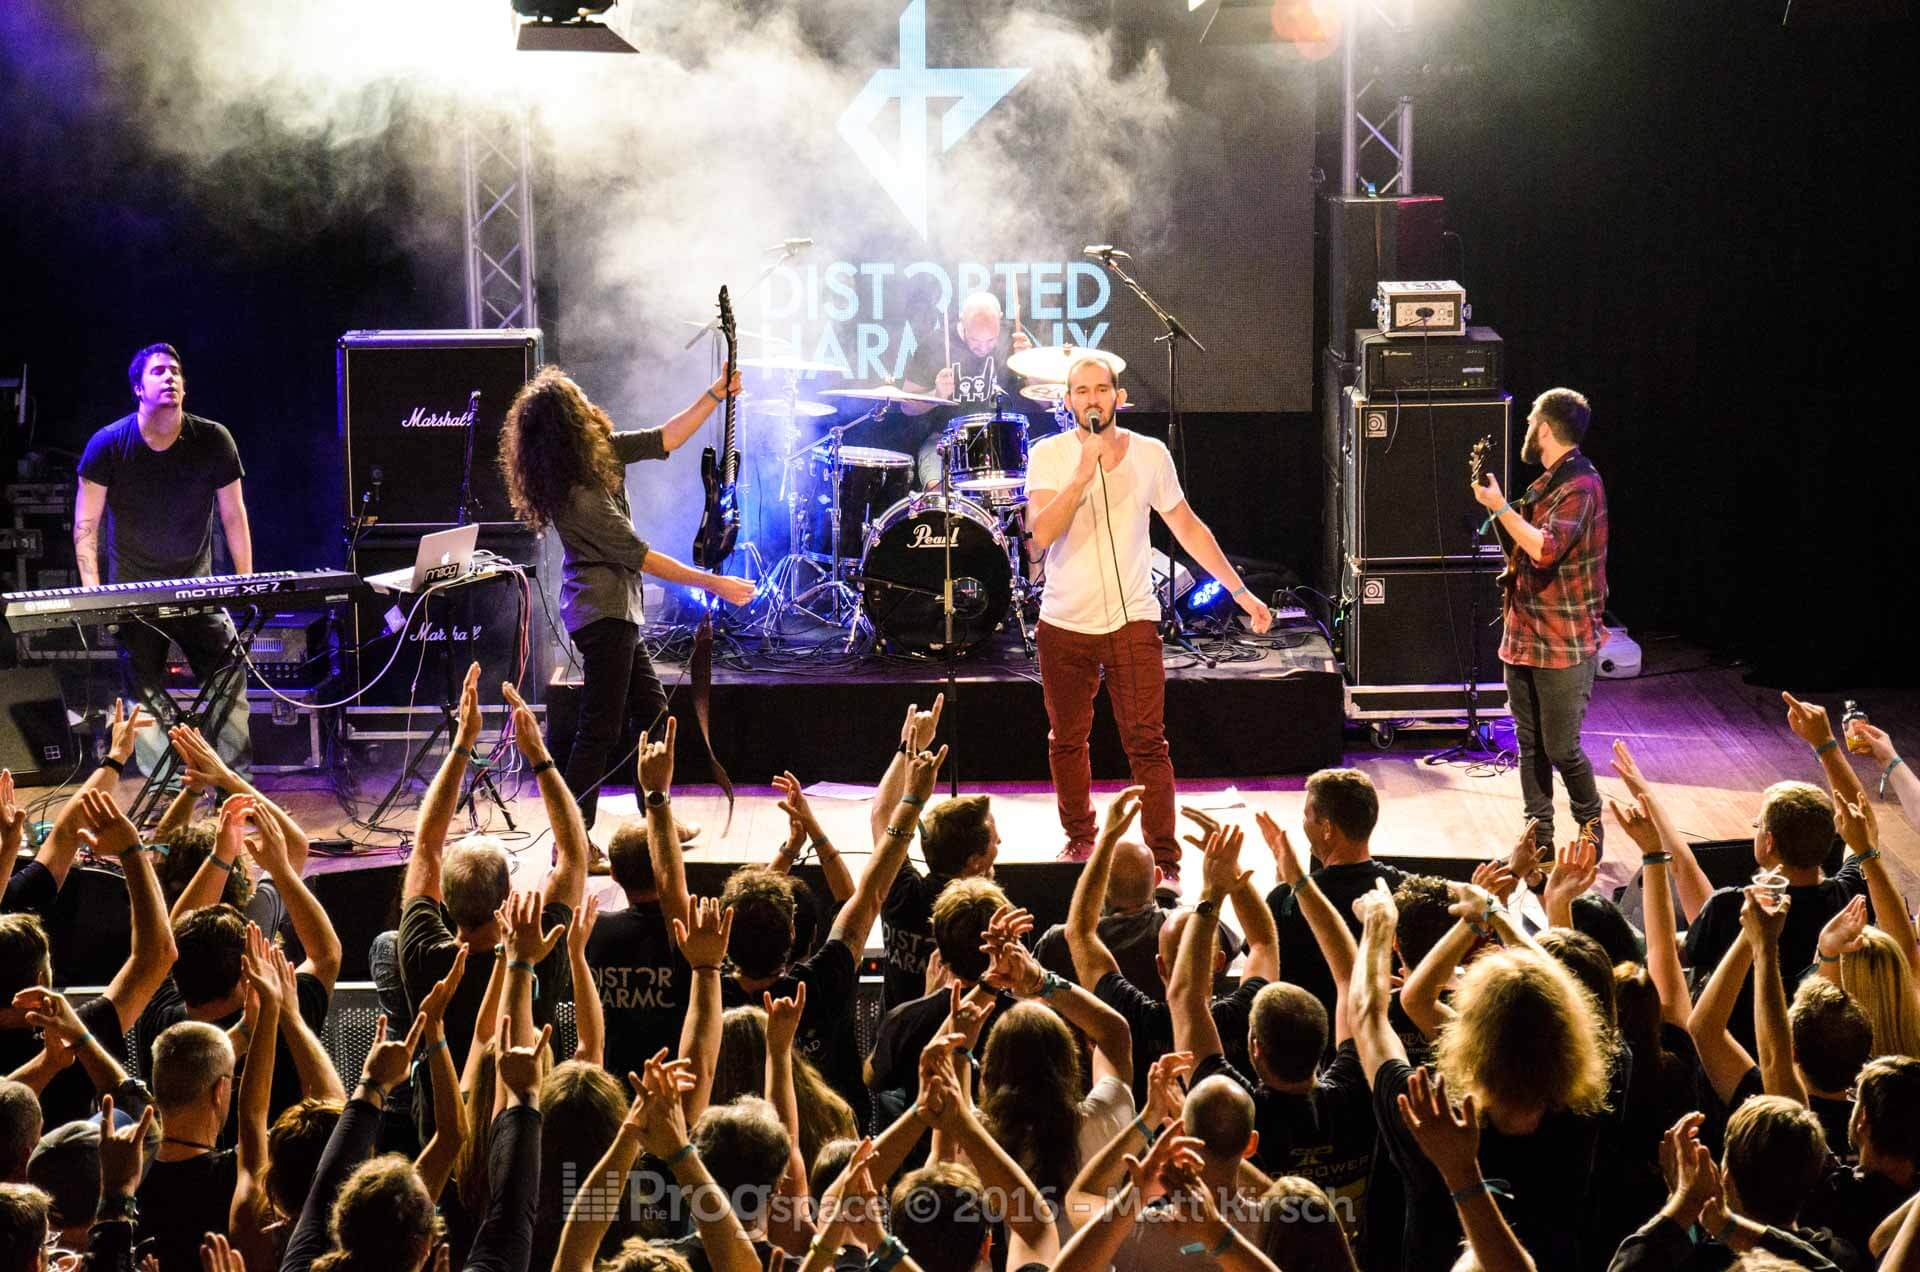 Distorted Harmony at ProgPower Europe 2016